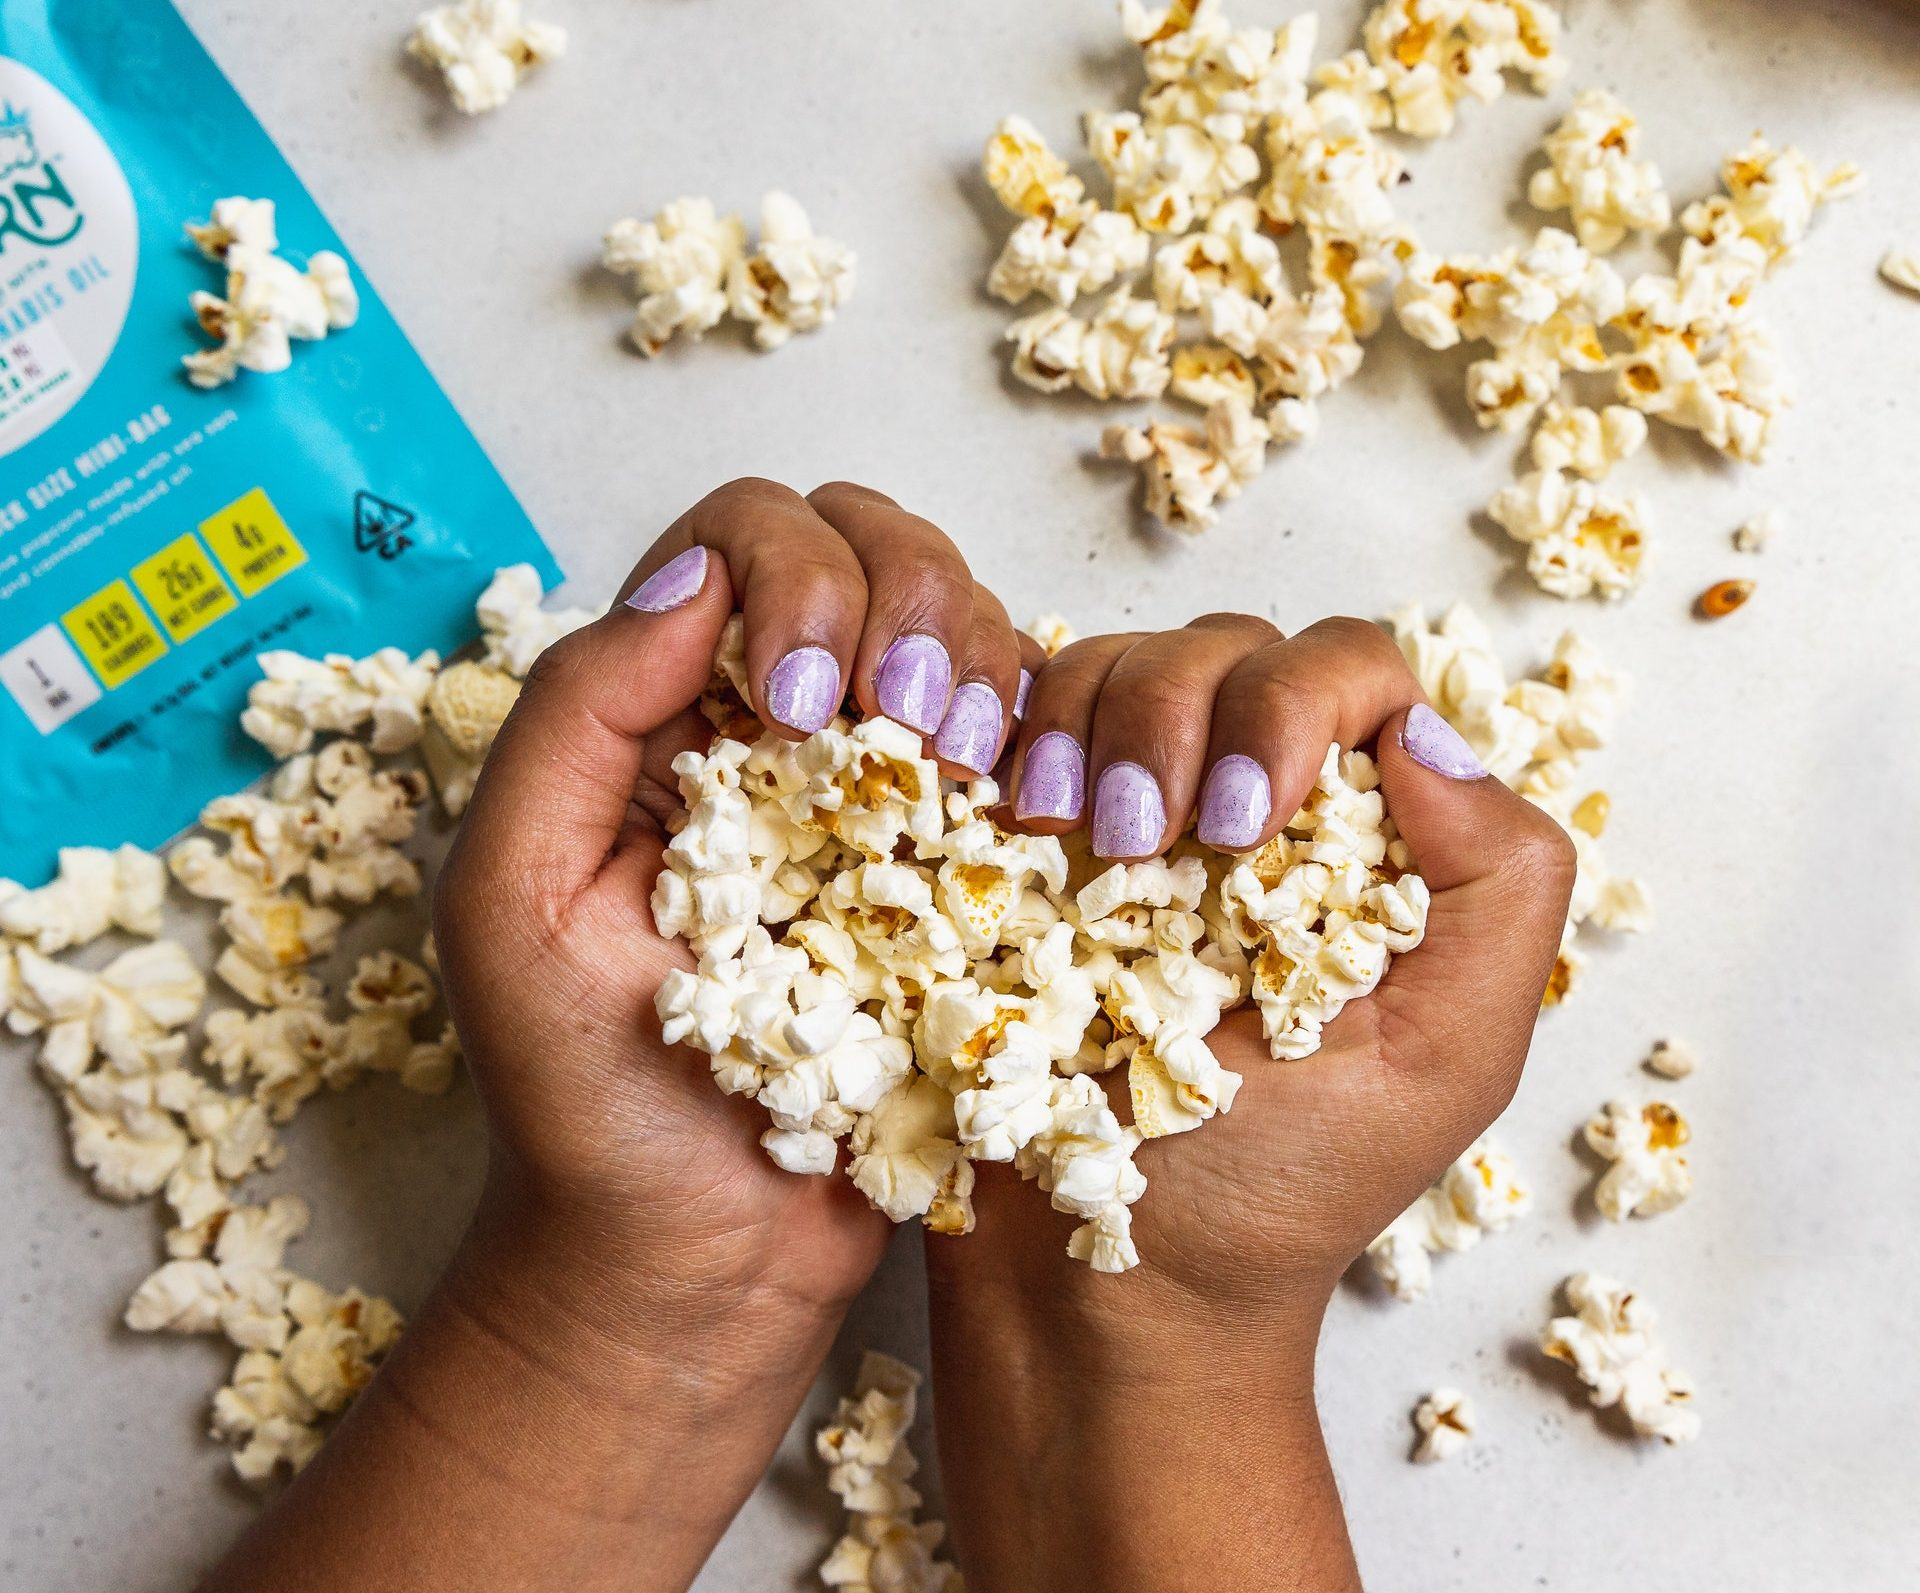 A heart-shaped fistful of popcorn